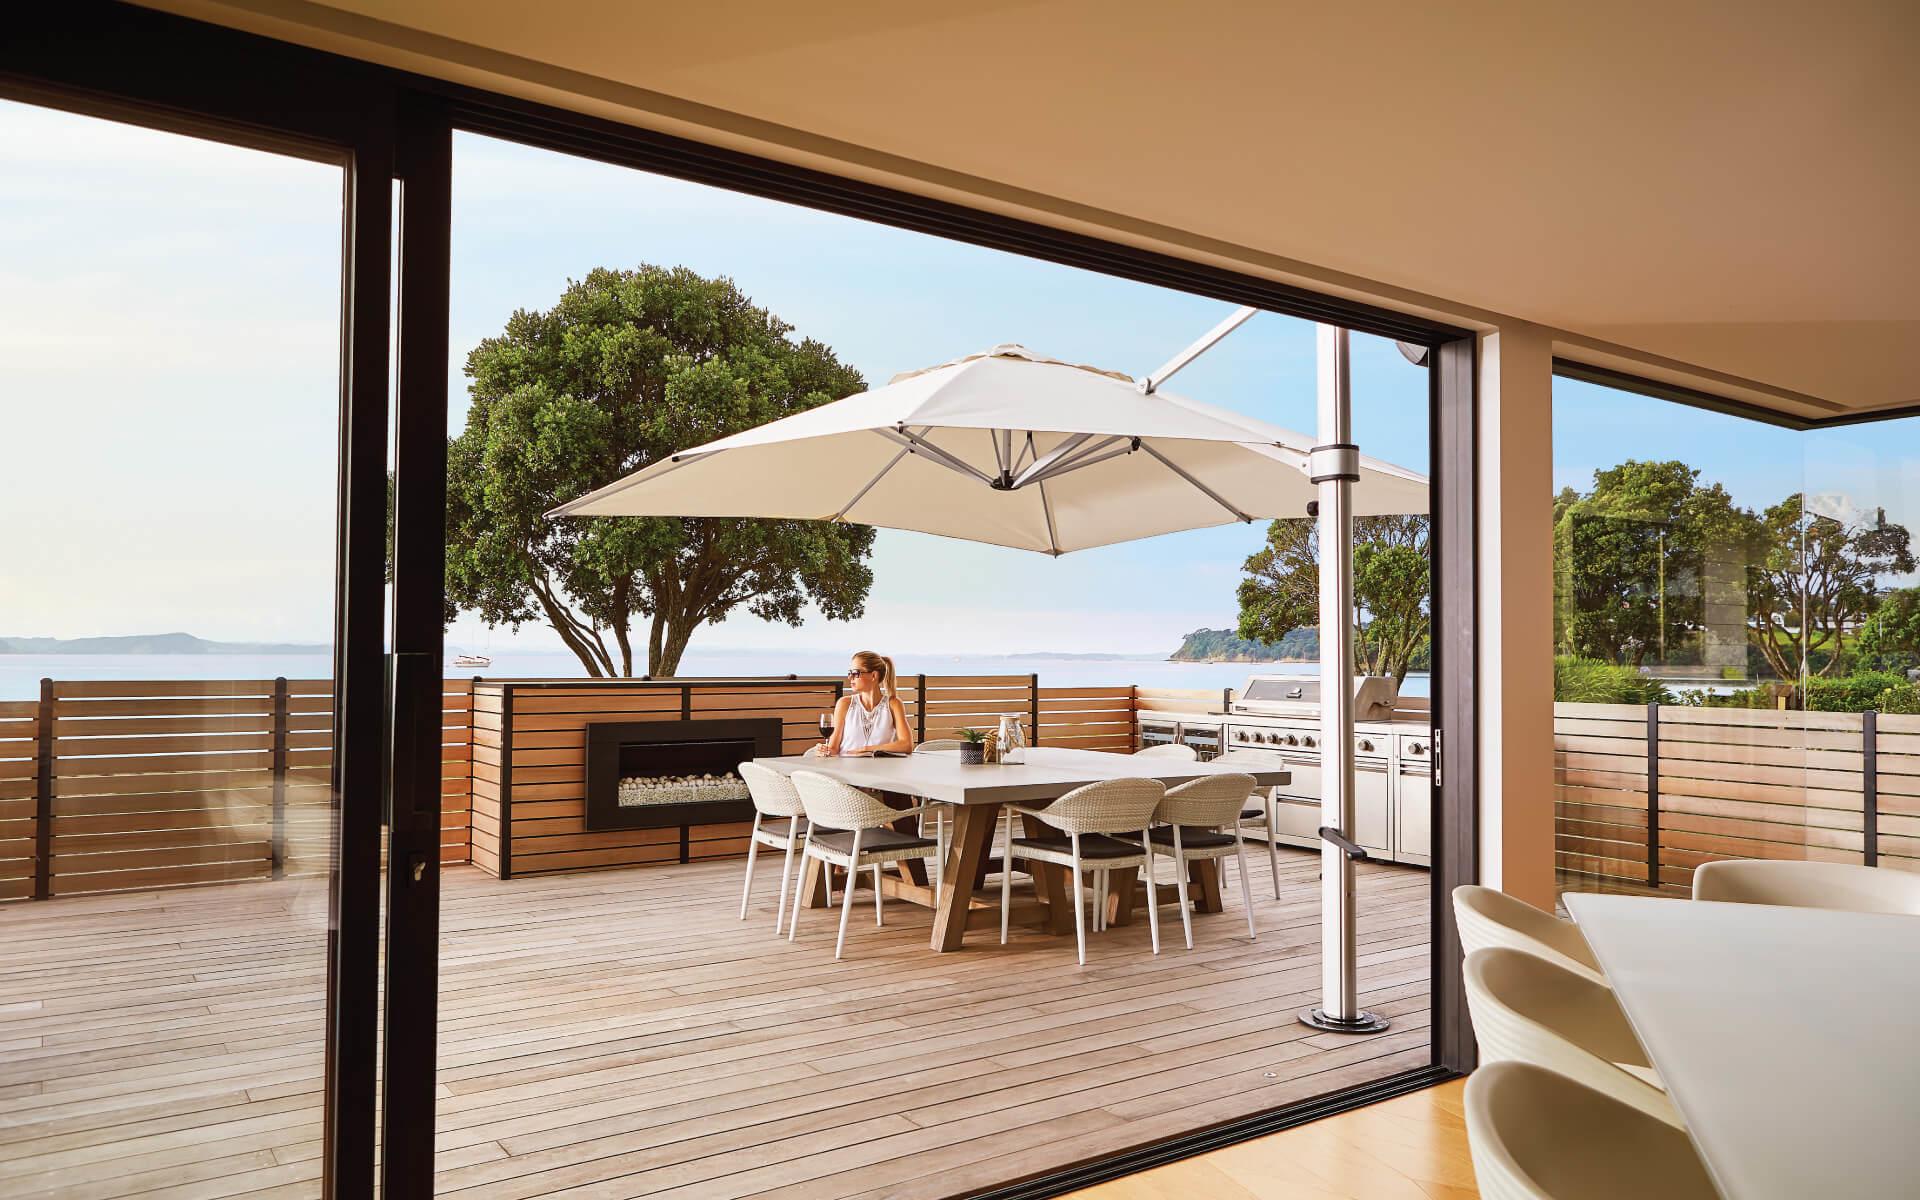 Riviera Cantilever Shade Umbrella for NZ Wooden Deck